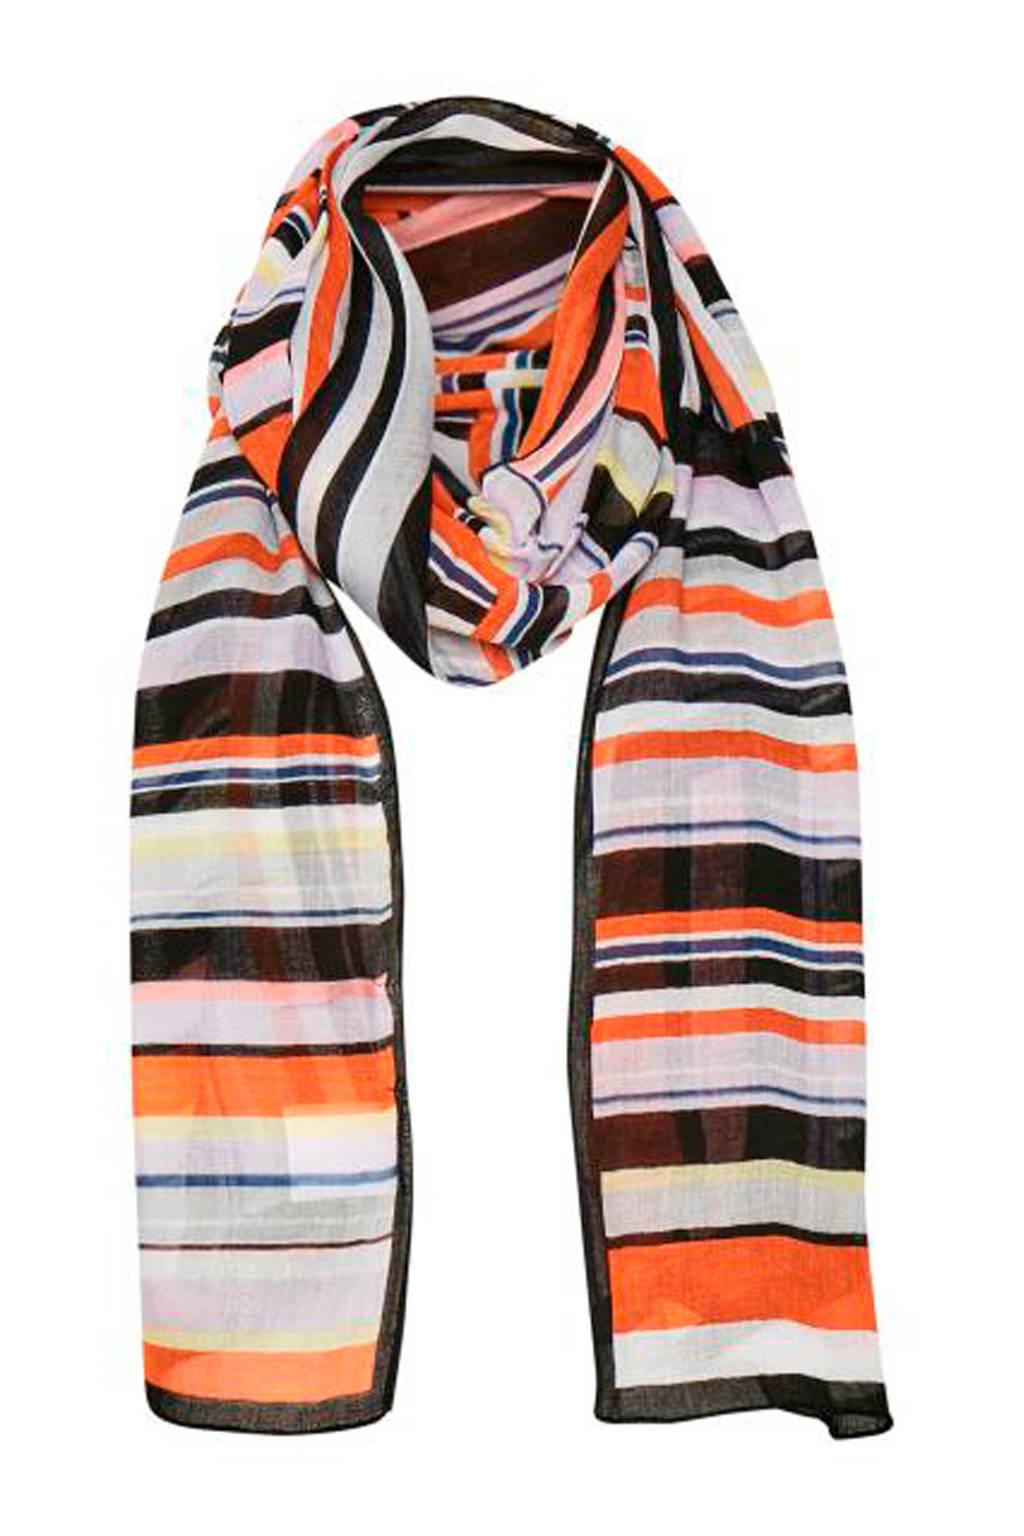 Inwear sjaal Vesta, oranje/wit/bruin